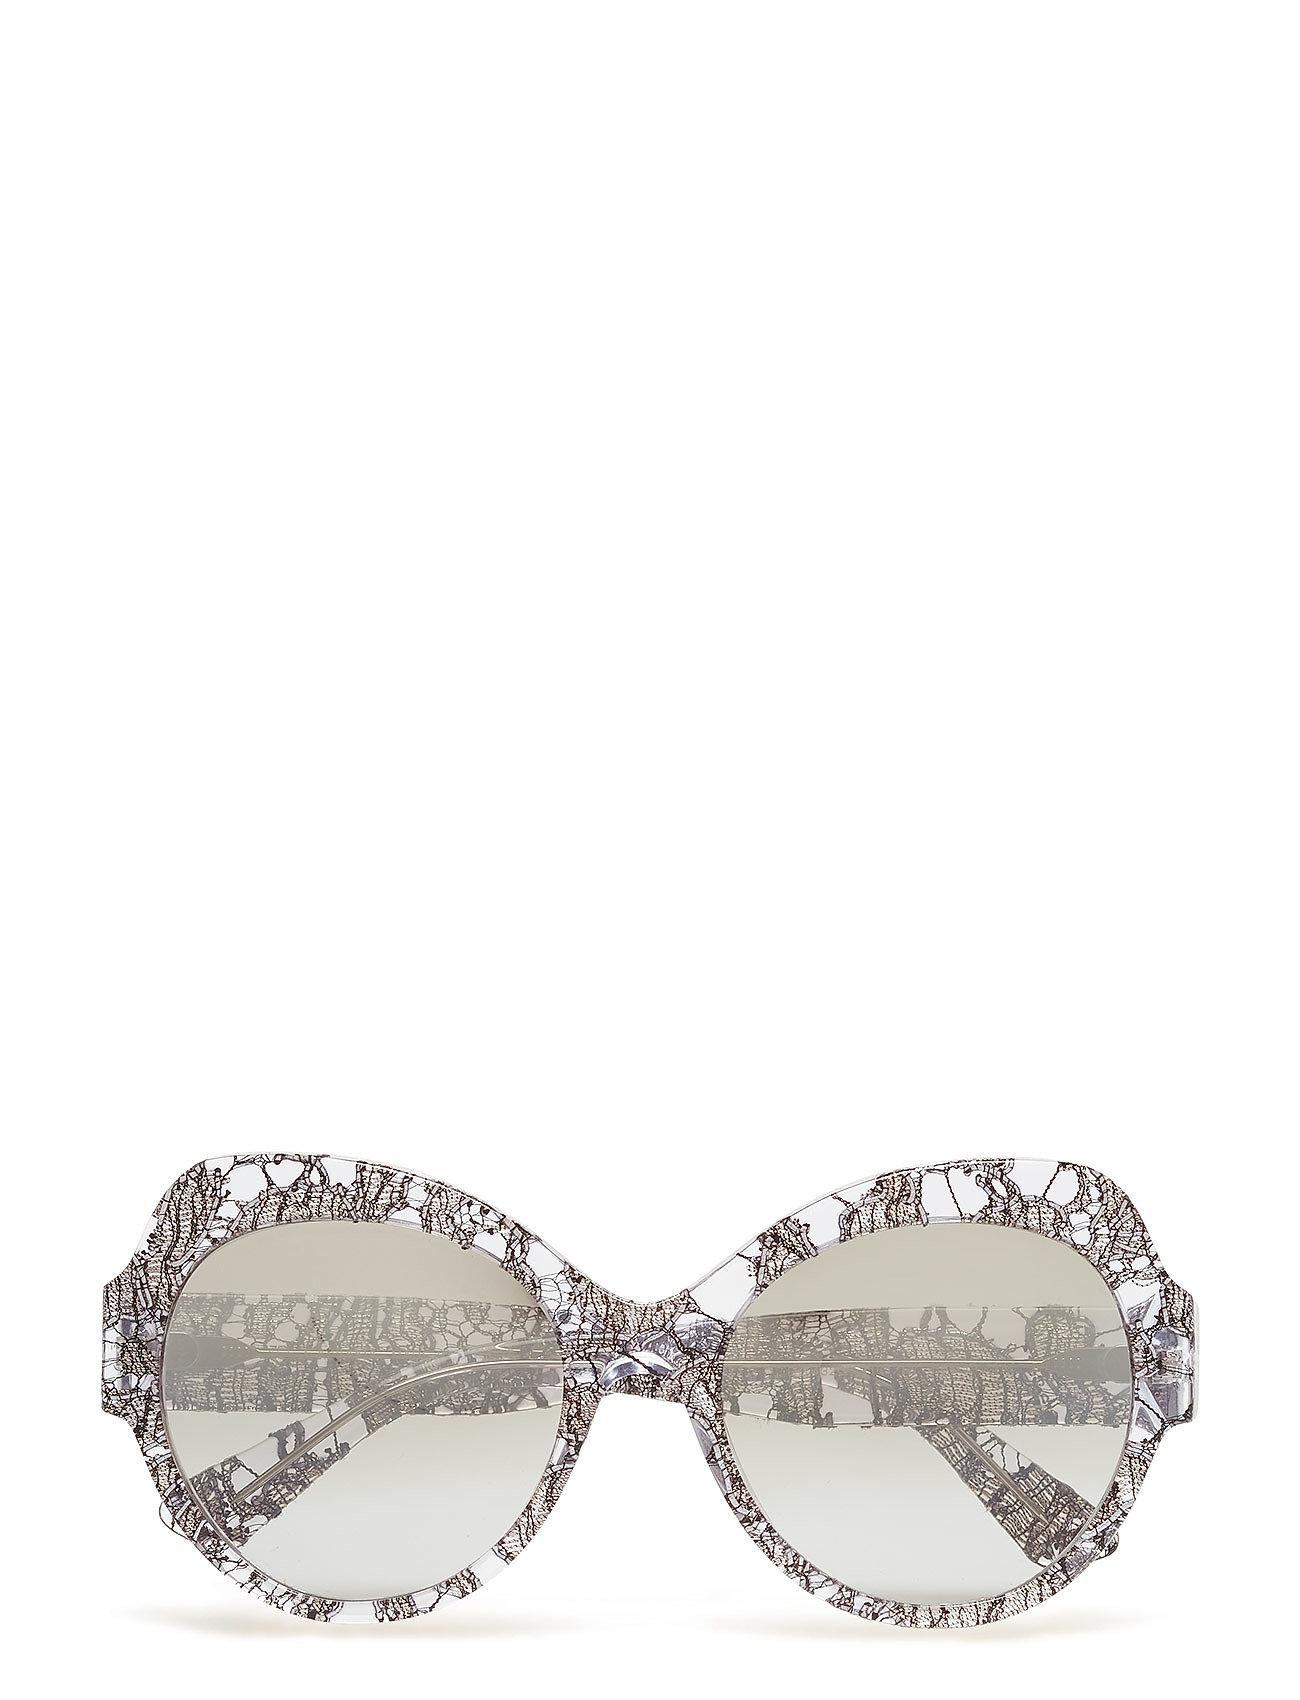 DOLCE & GABBANA Women'S Sunglasses Sonnenbrille Schwarz DOLCE & GABBANA SUNGLASSES